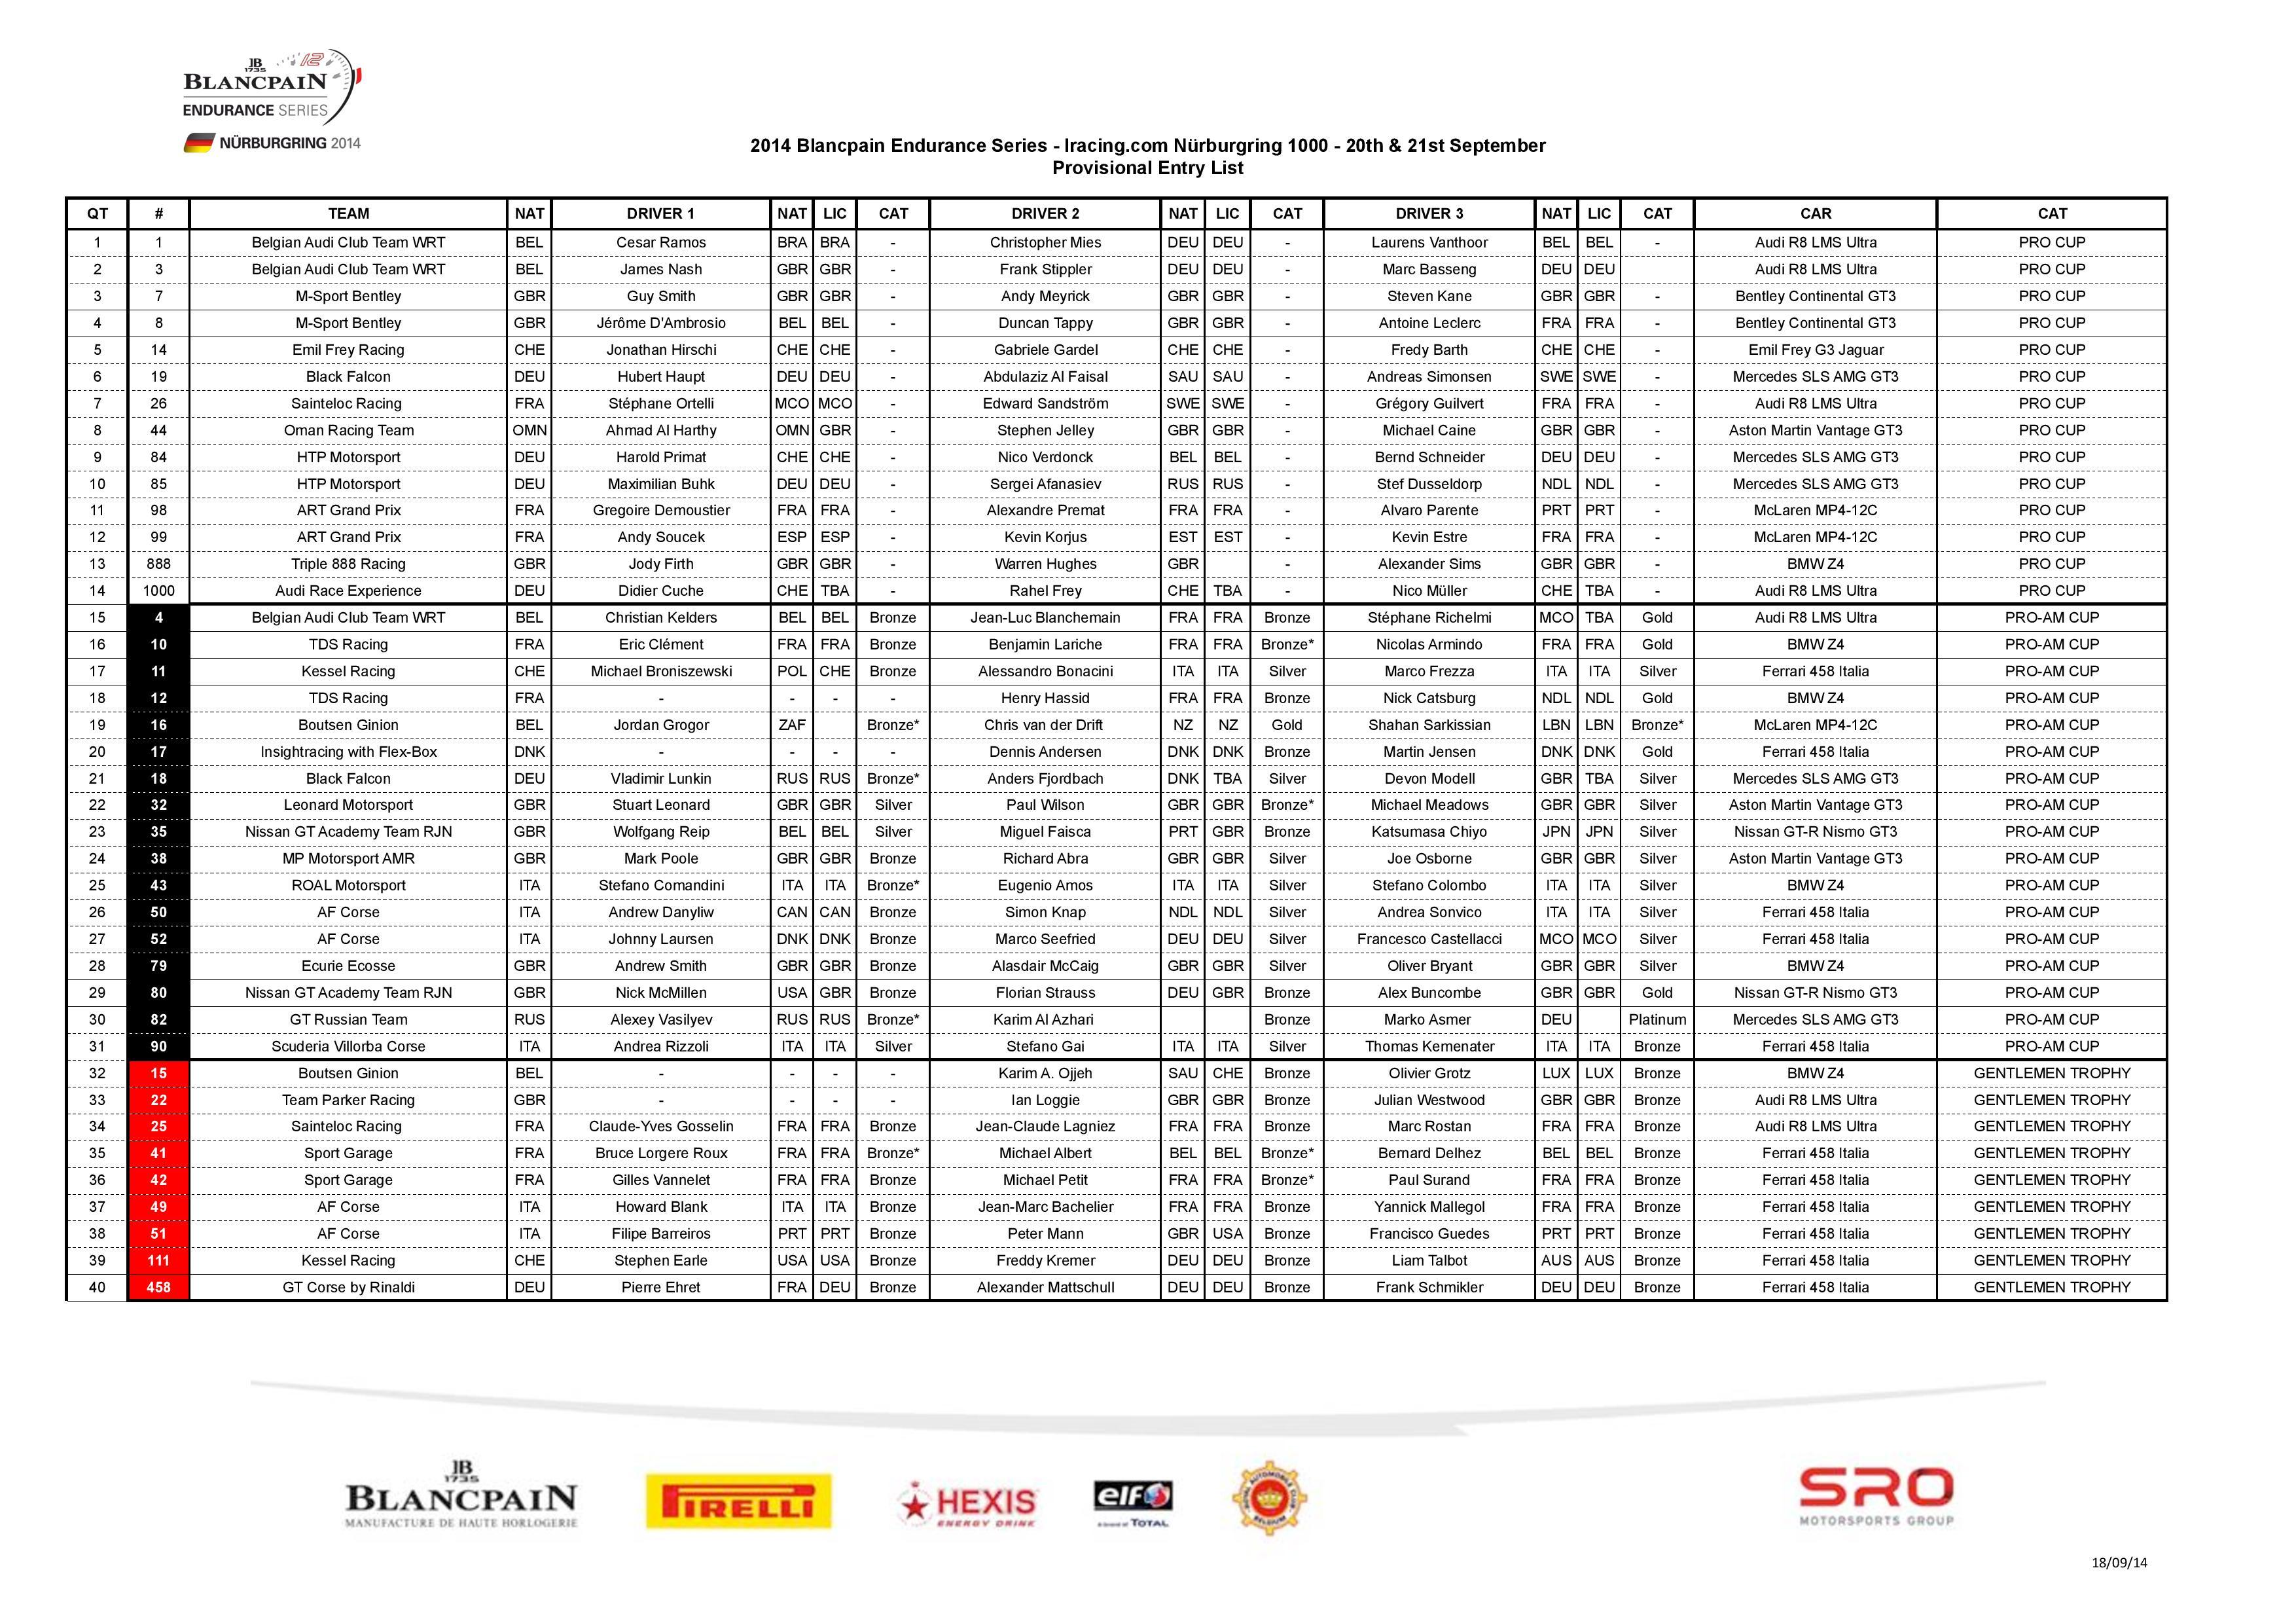 Entry list update for iRacing com Nürburgring 1000